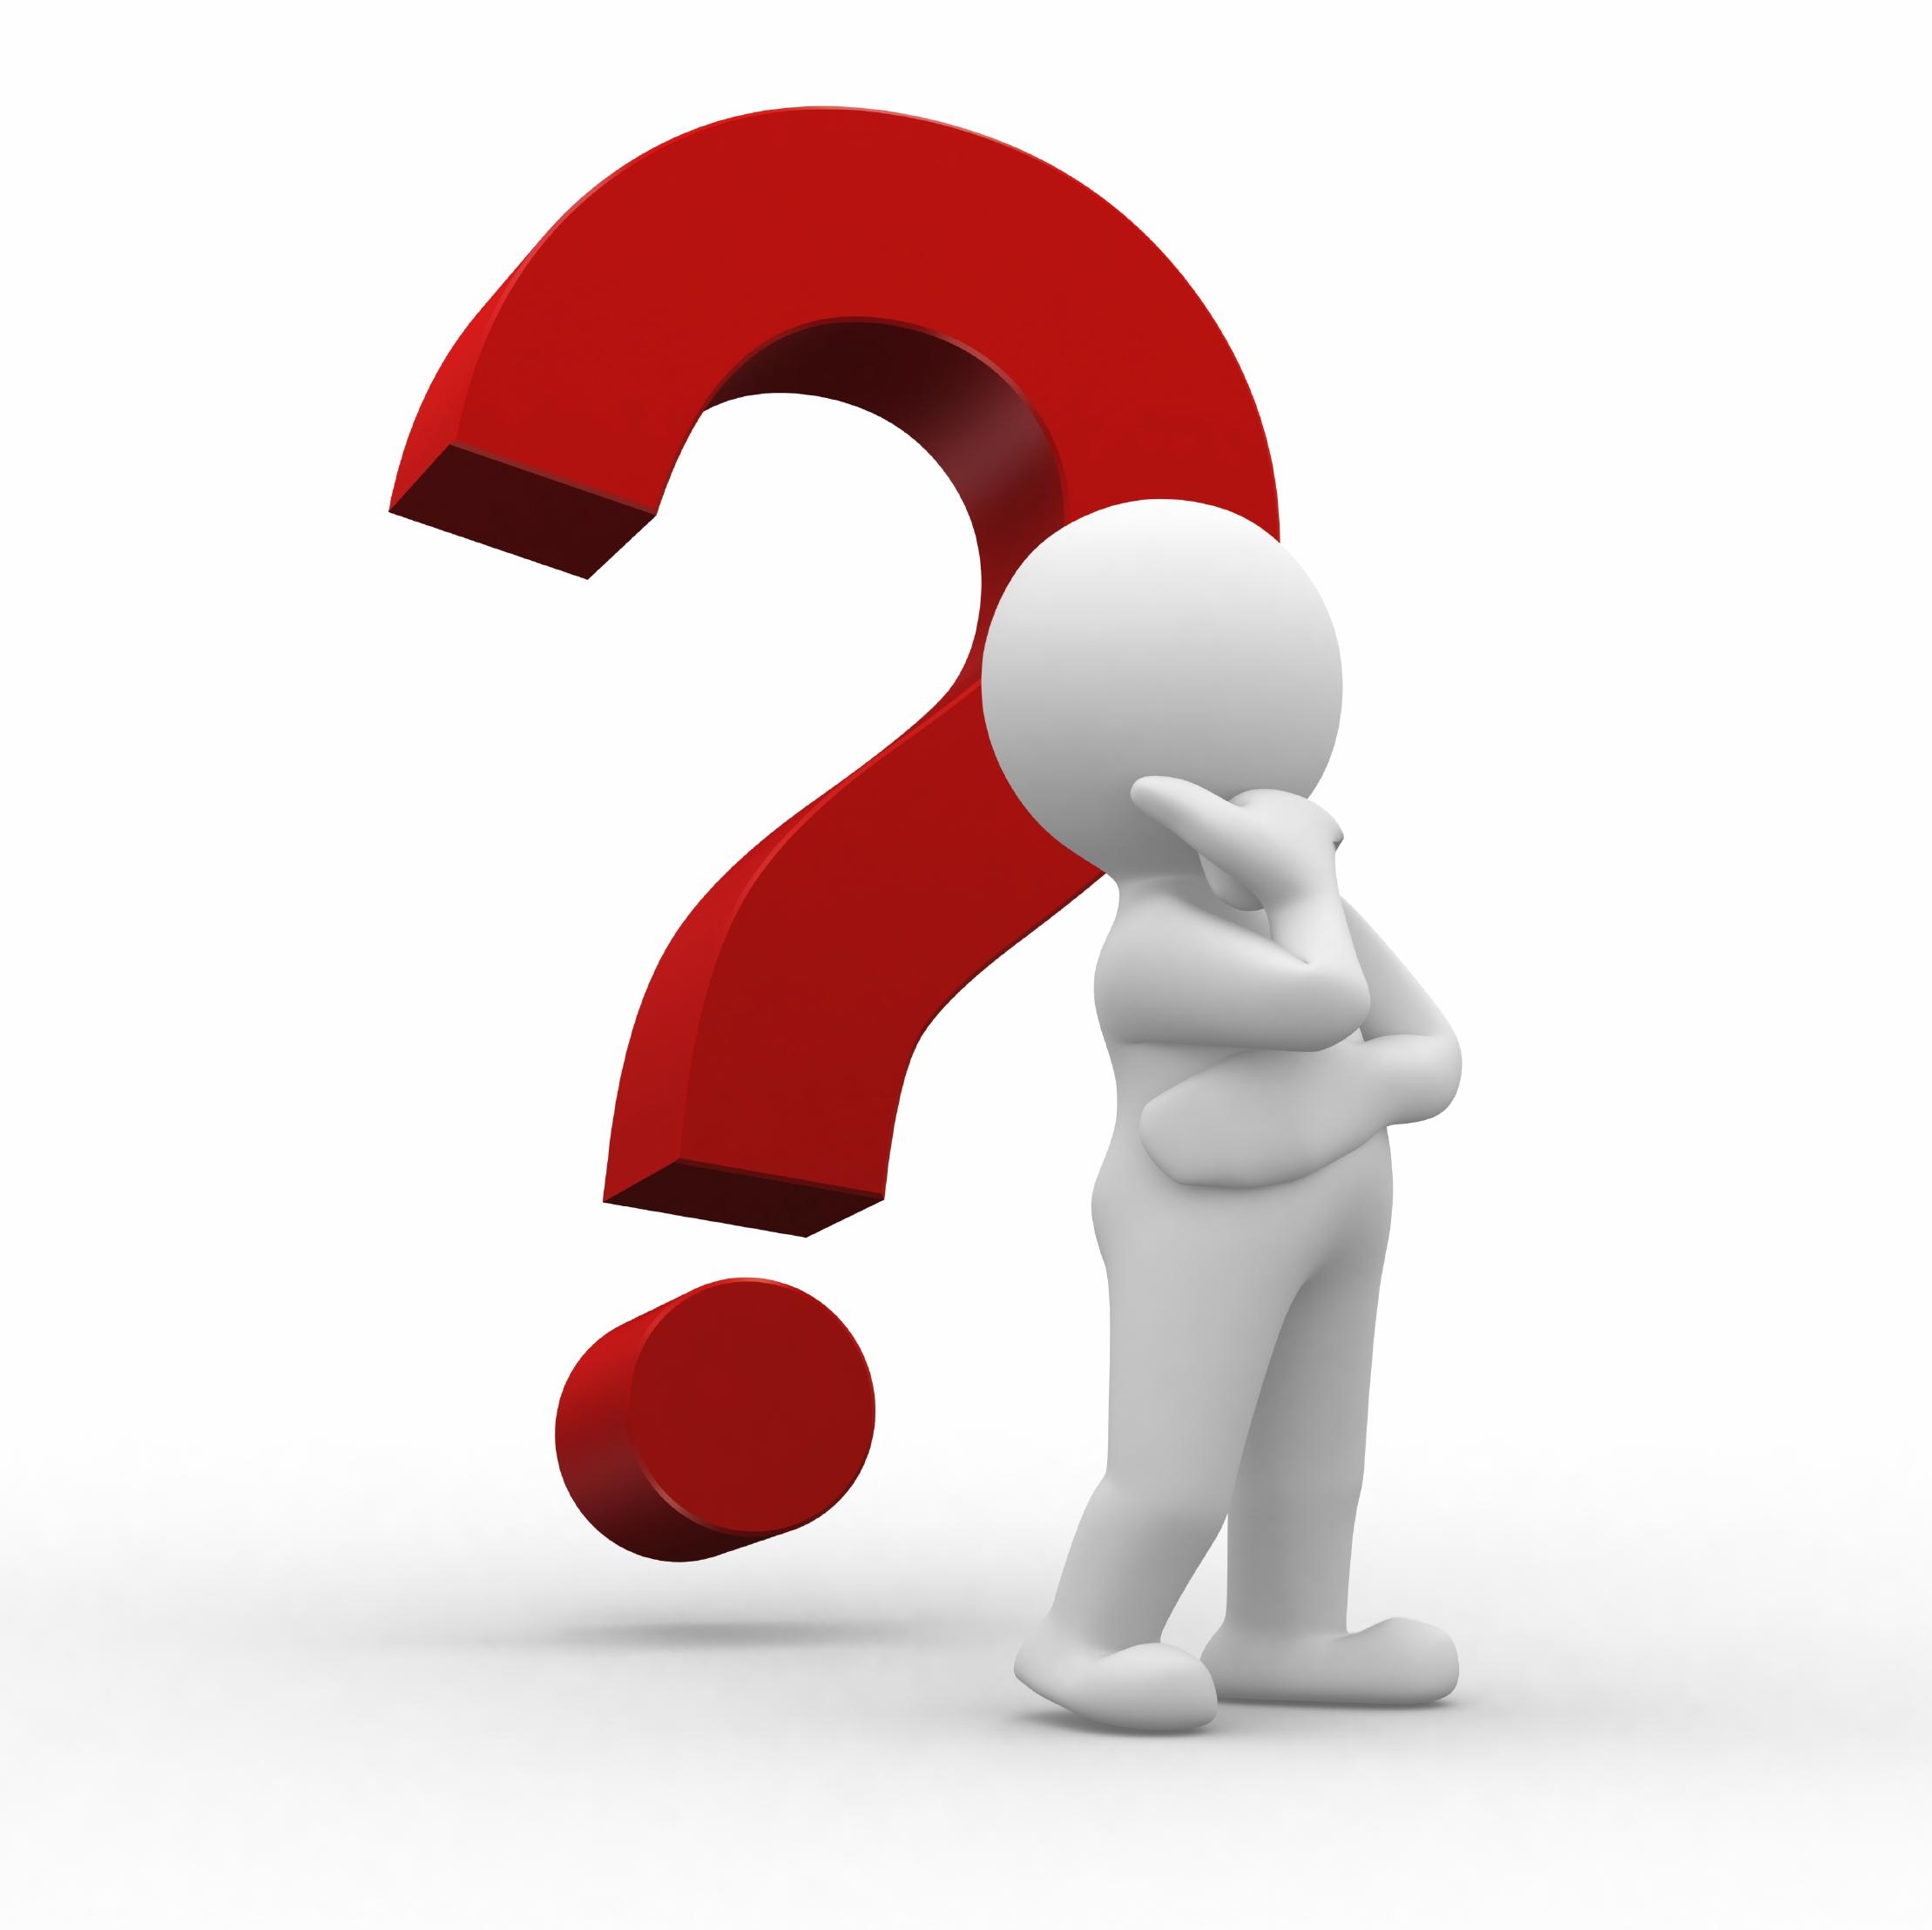 Clipart Question Mark 3d - Question Mark Clipart